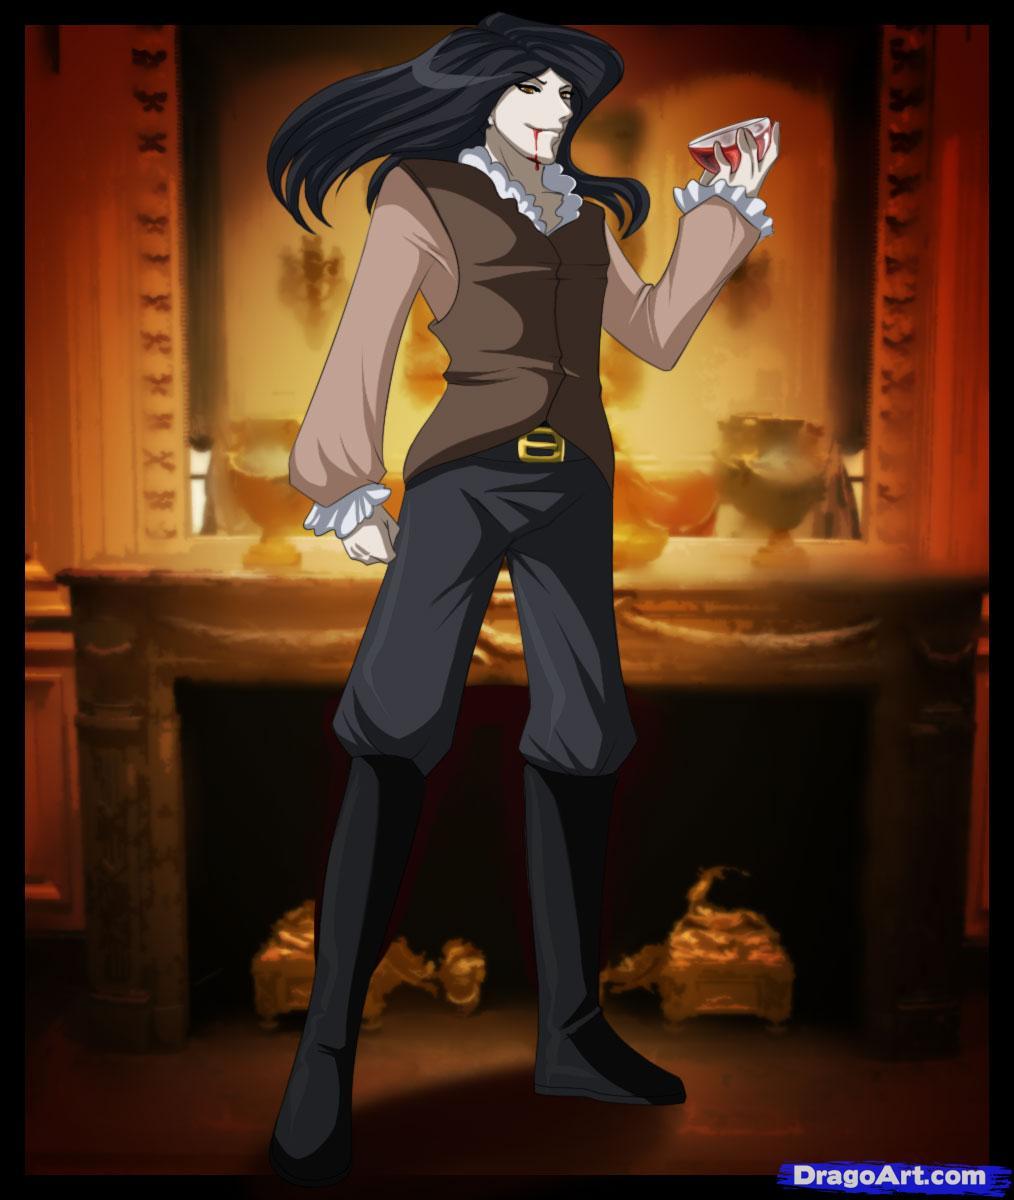 Drawn vampire anime vampire male By How to anime vampires